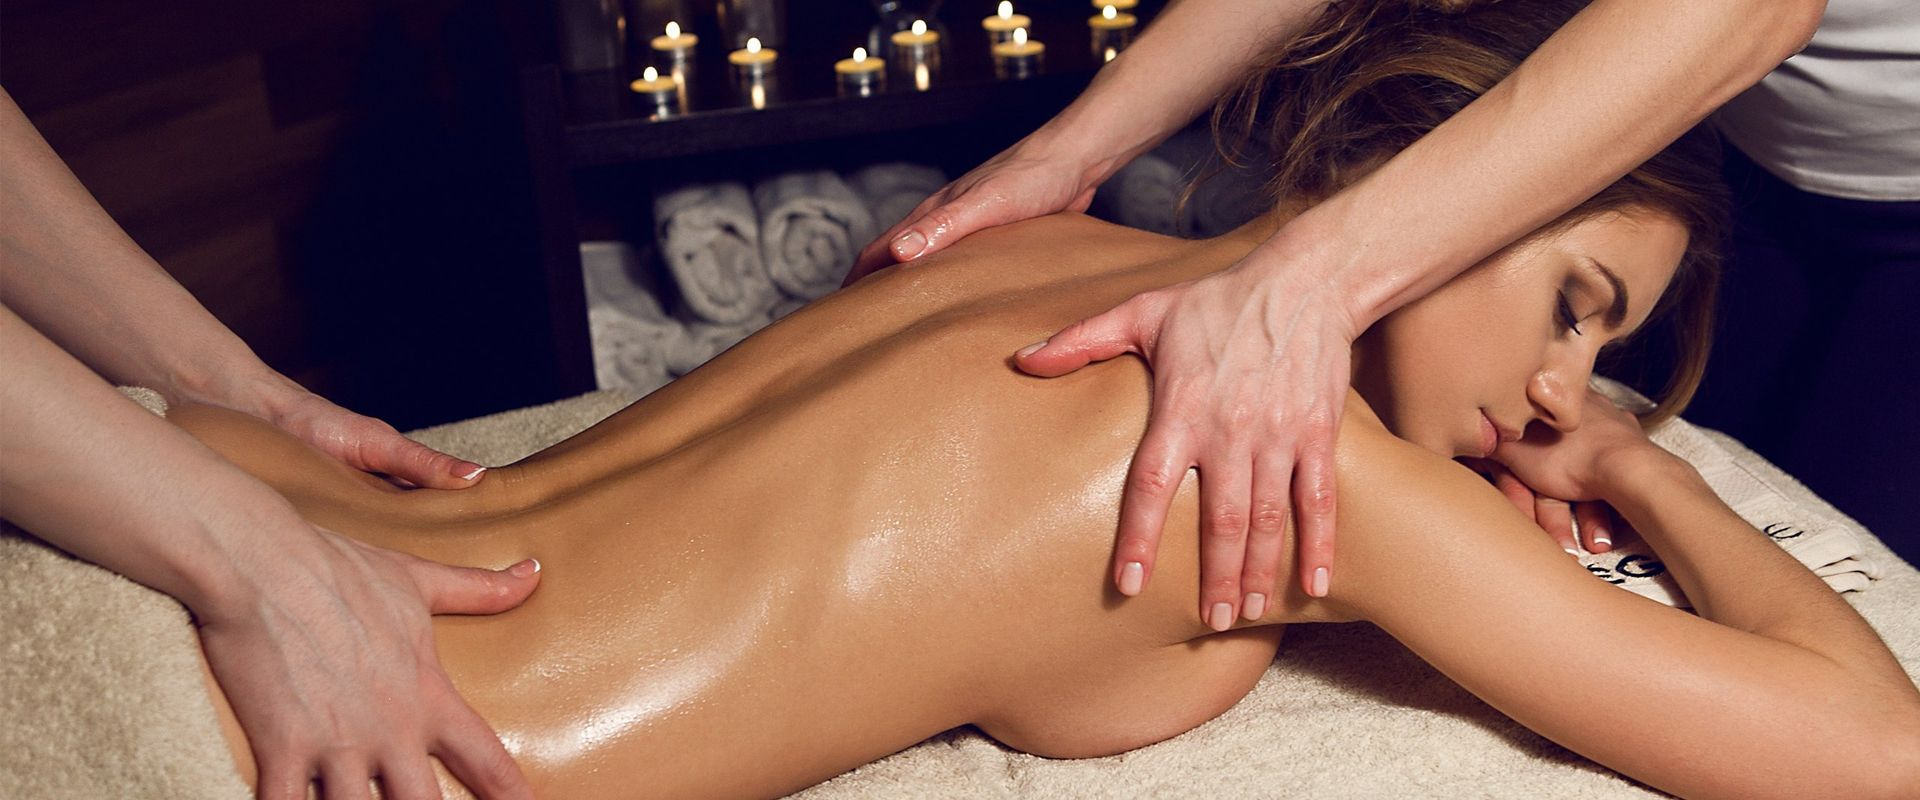 Шикарный массаж видео губах фото